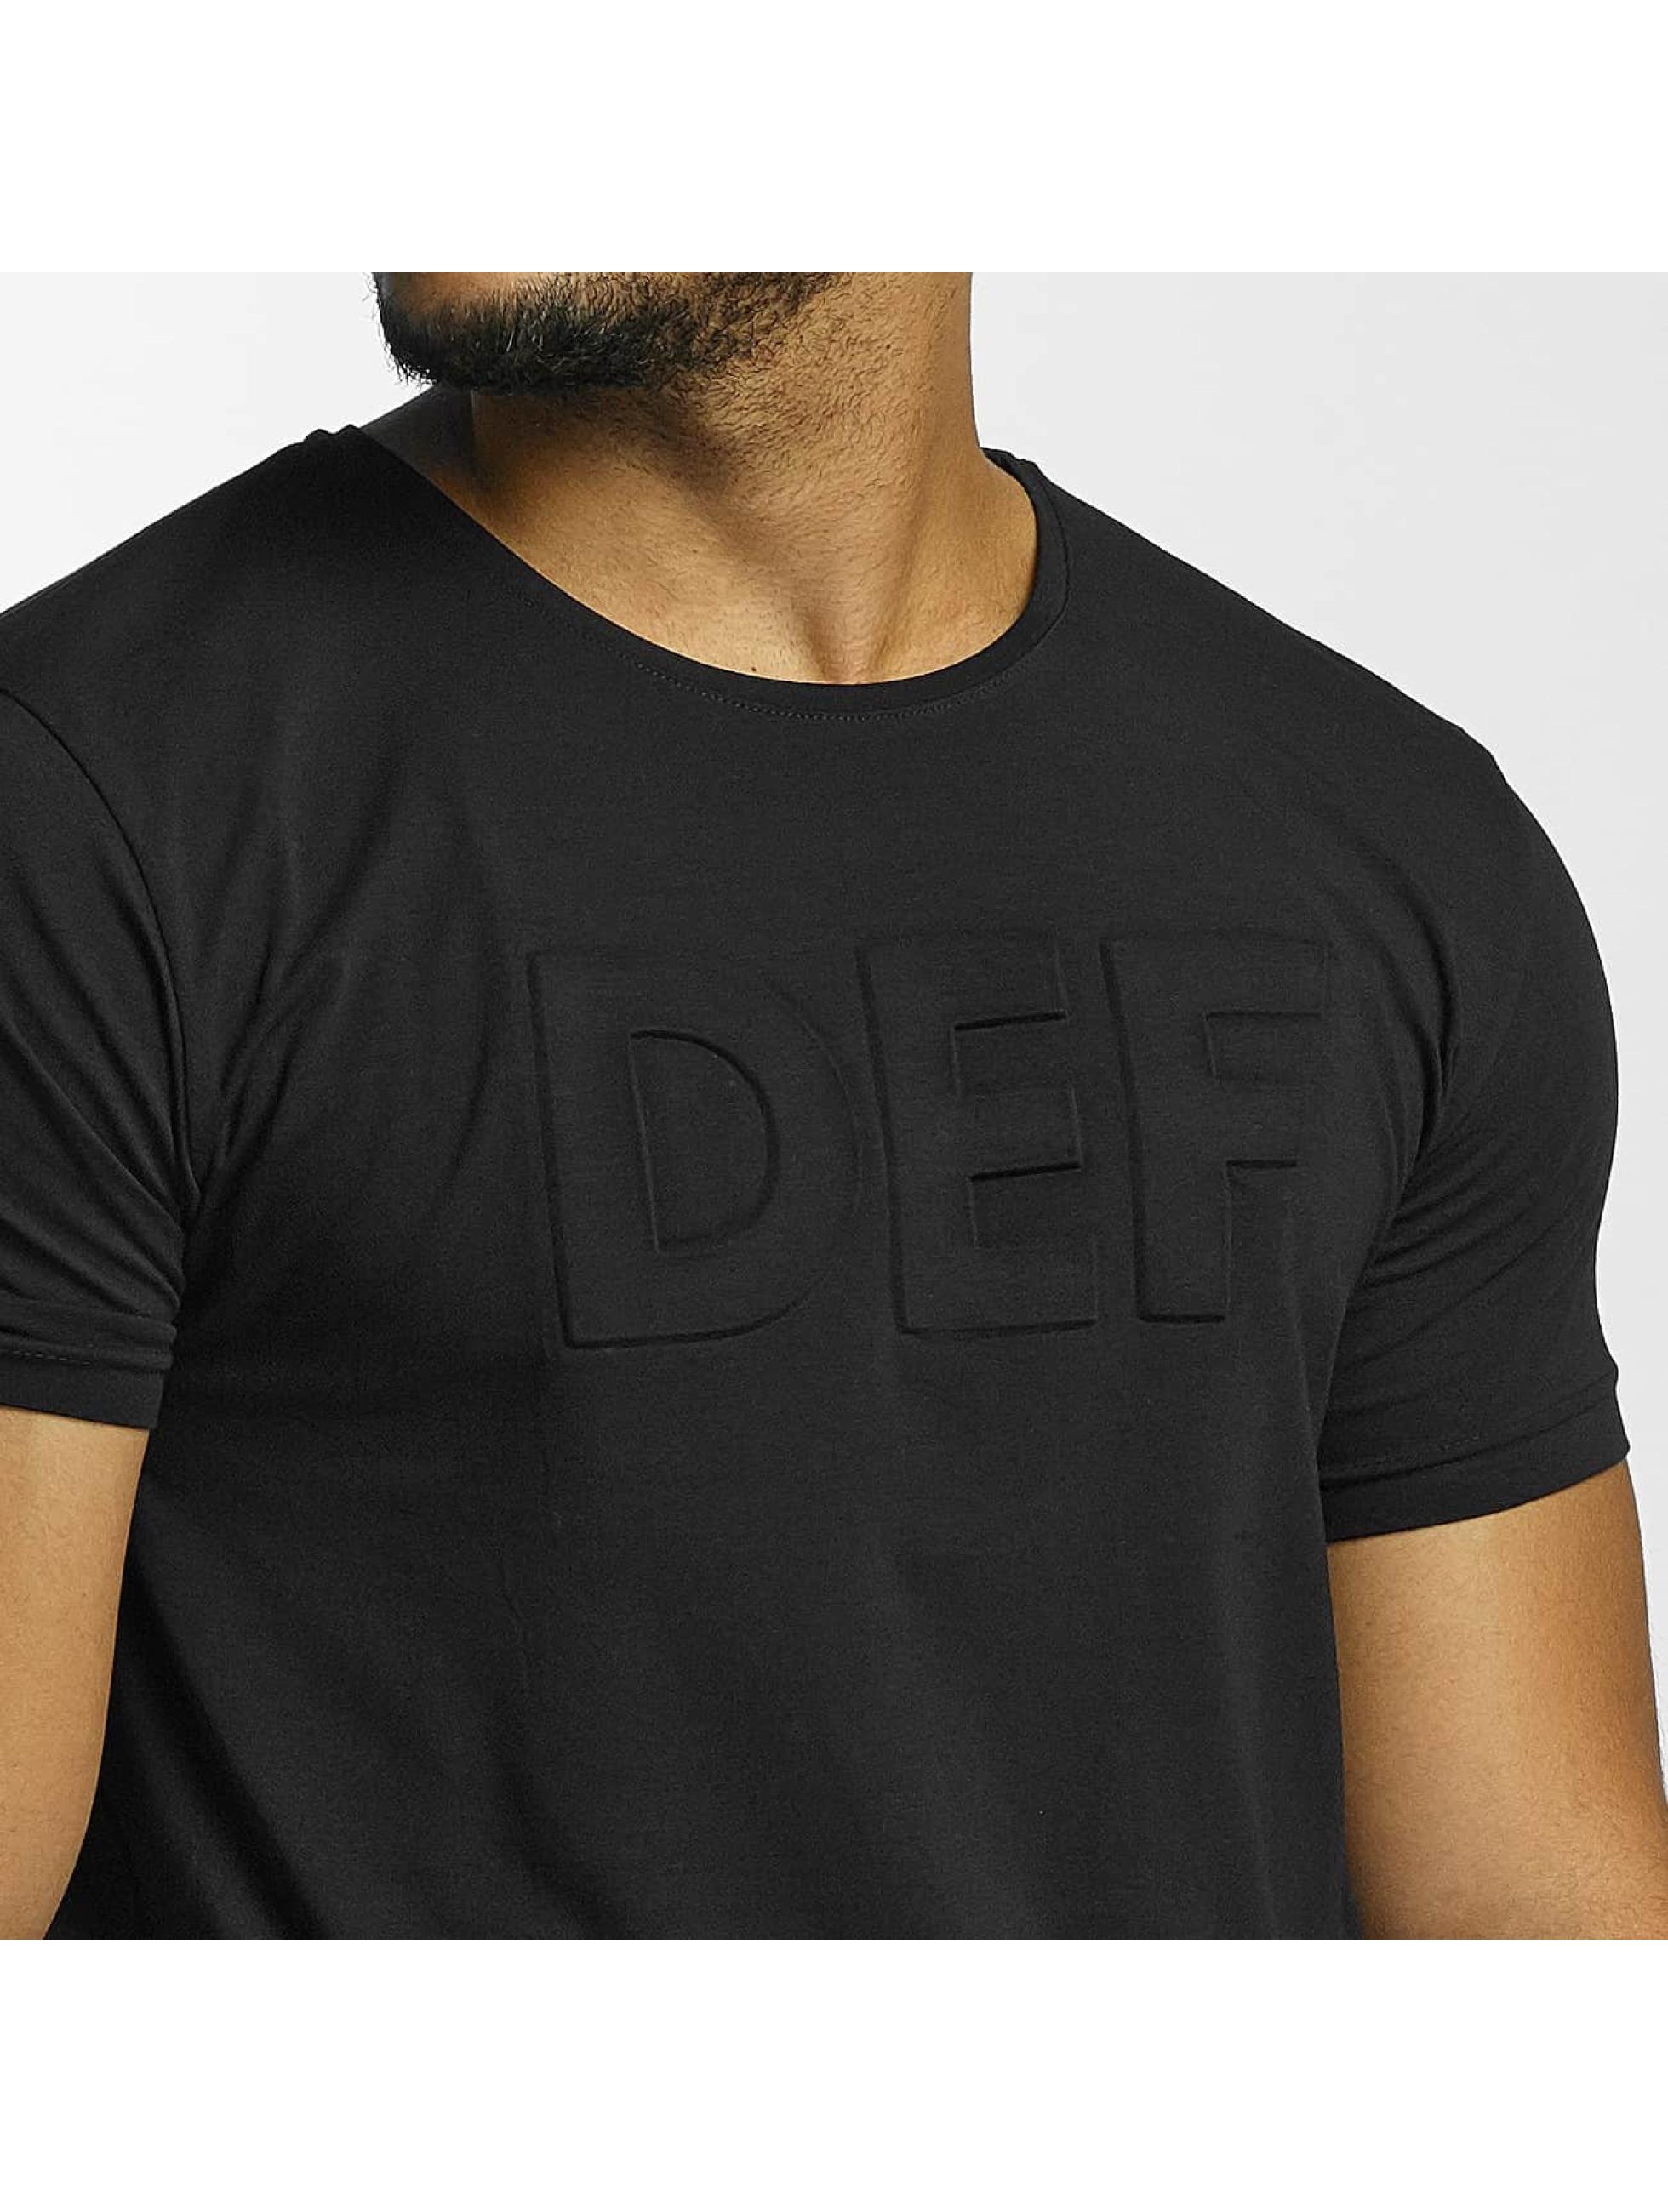 DEF T-skjorter Come Out svart